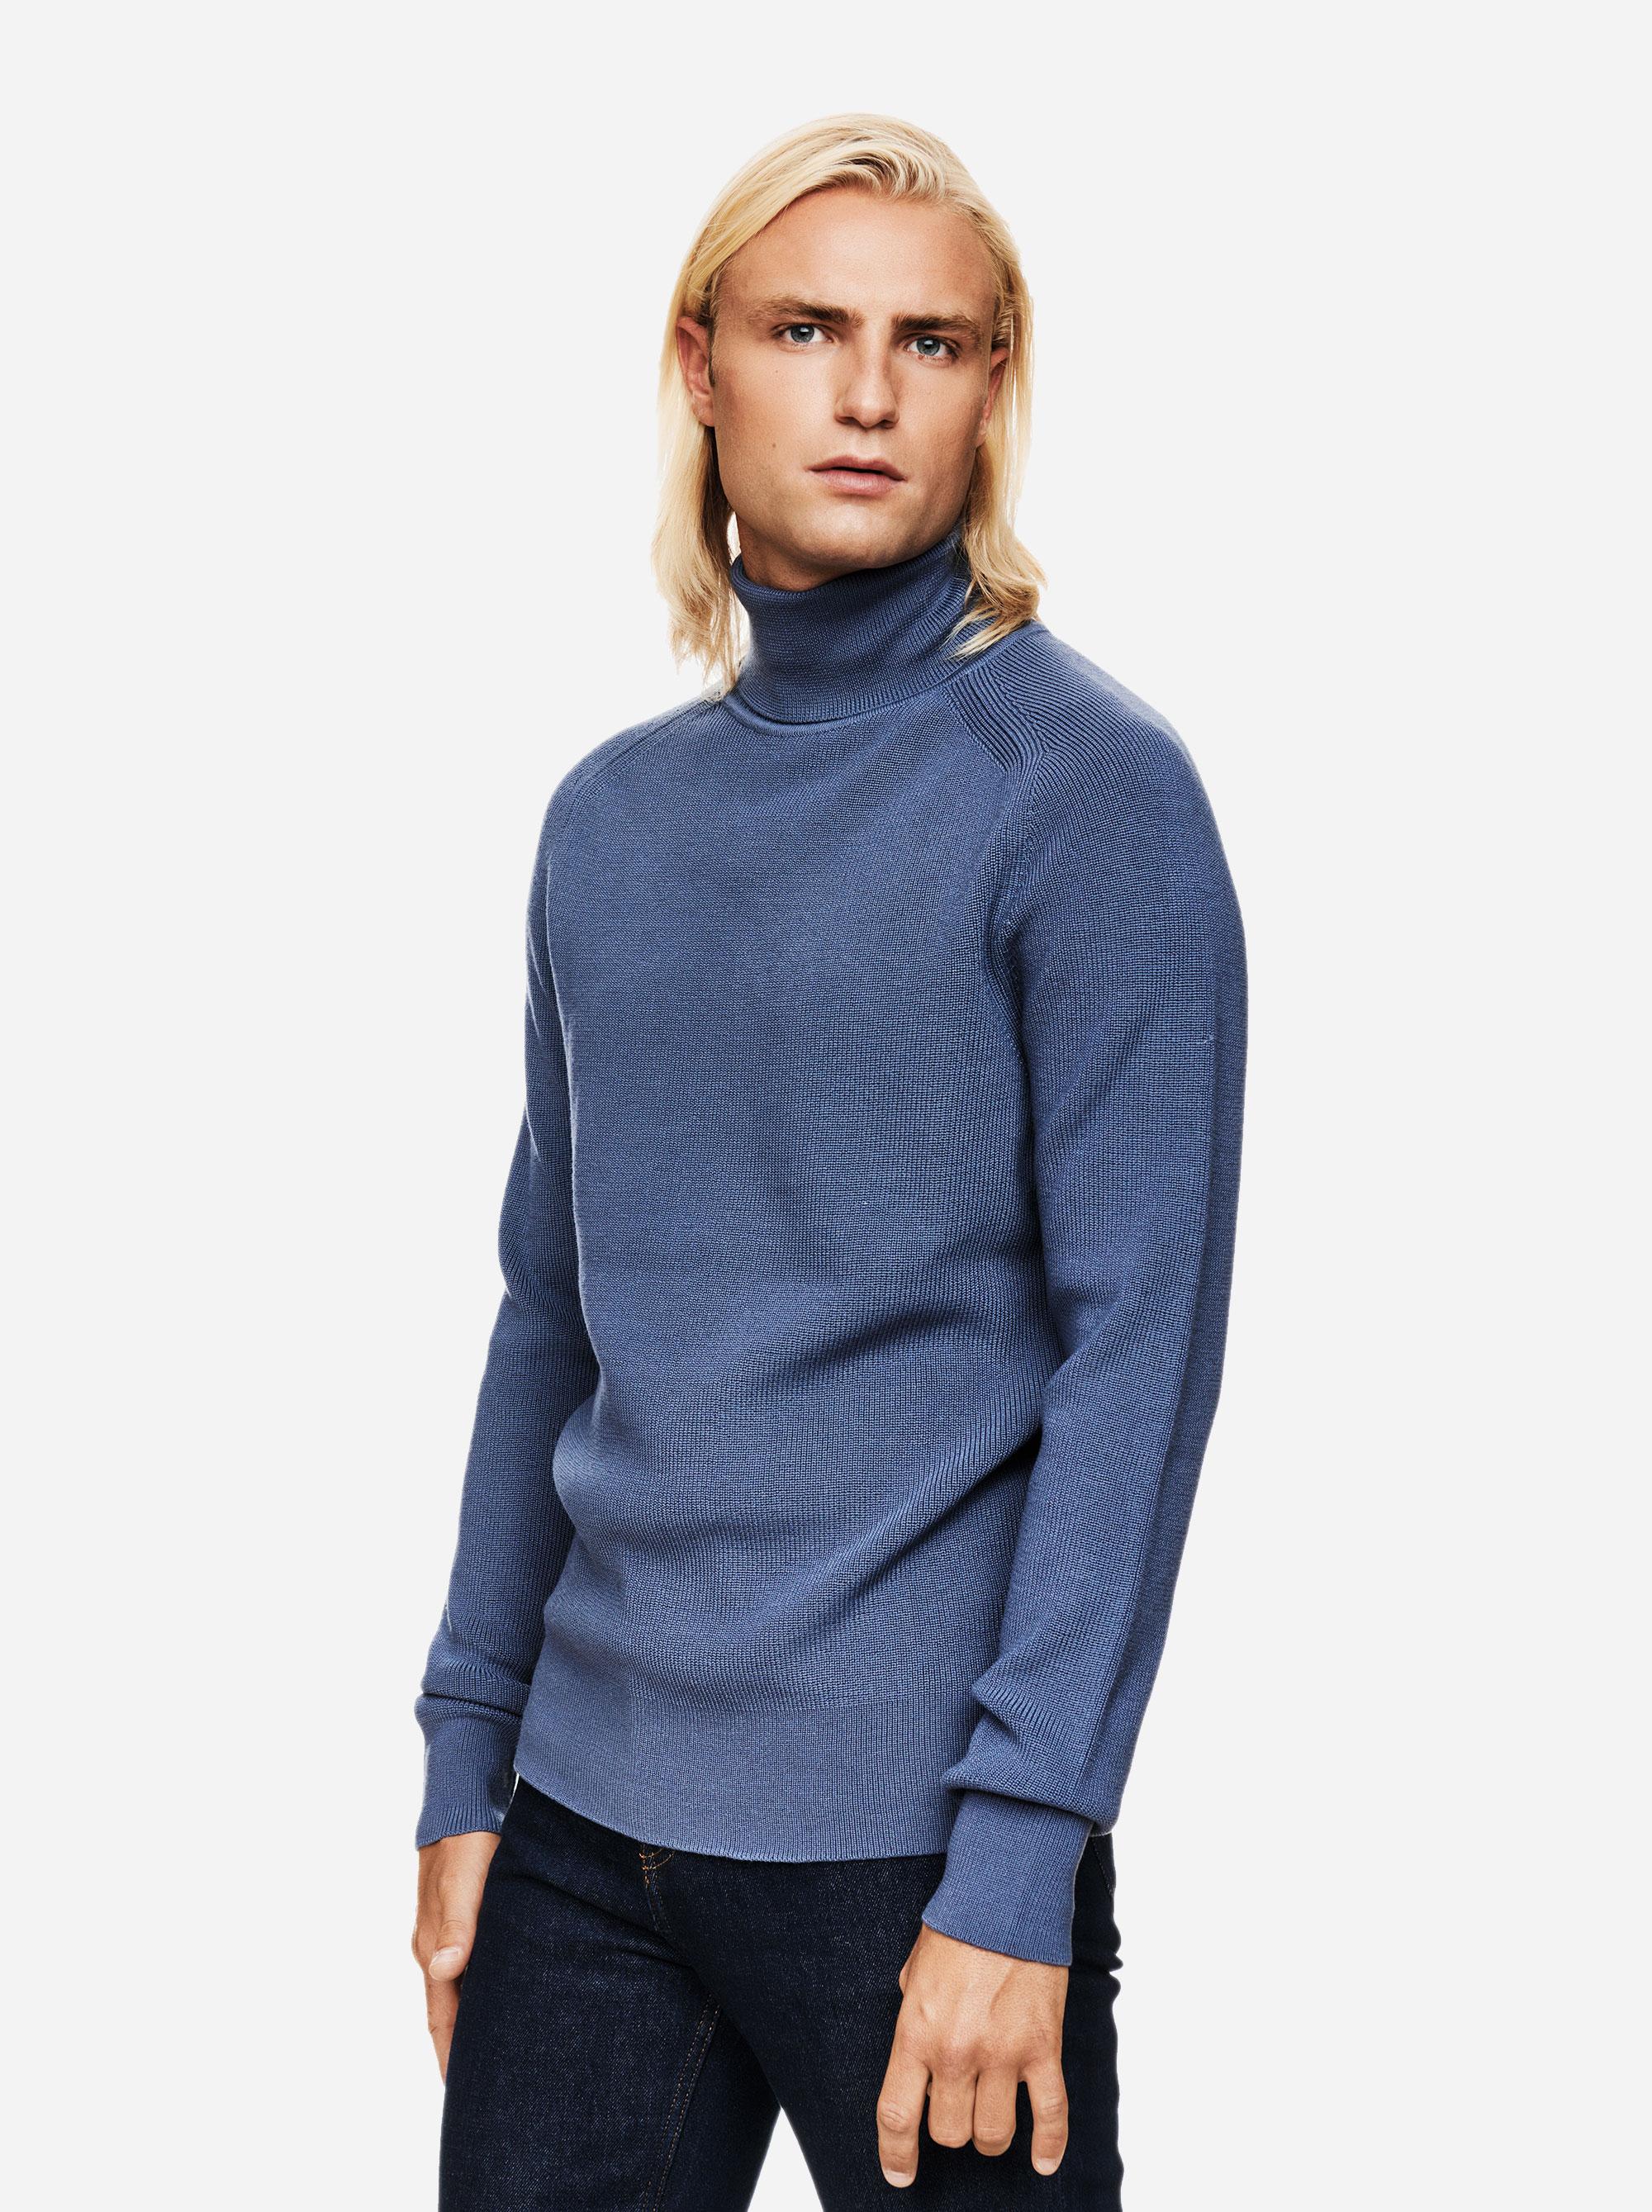 Teym - Turtleneck - The Merino Sweater - Men - Sky Blue - 2